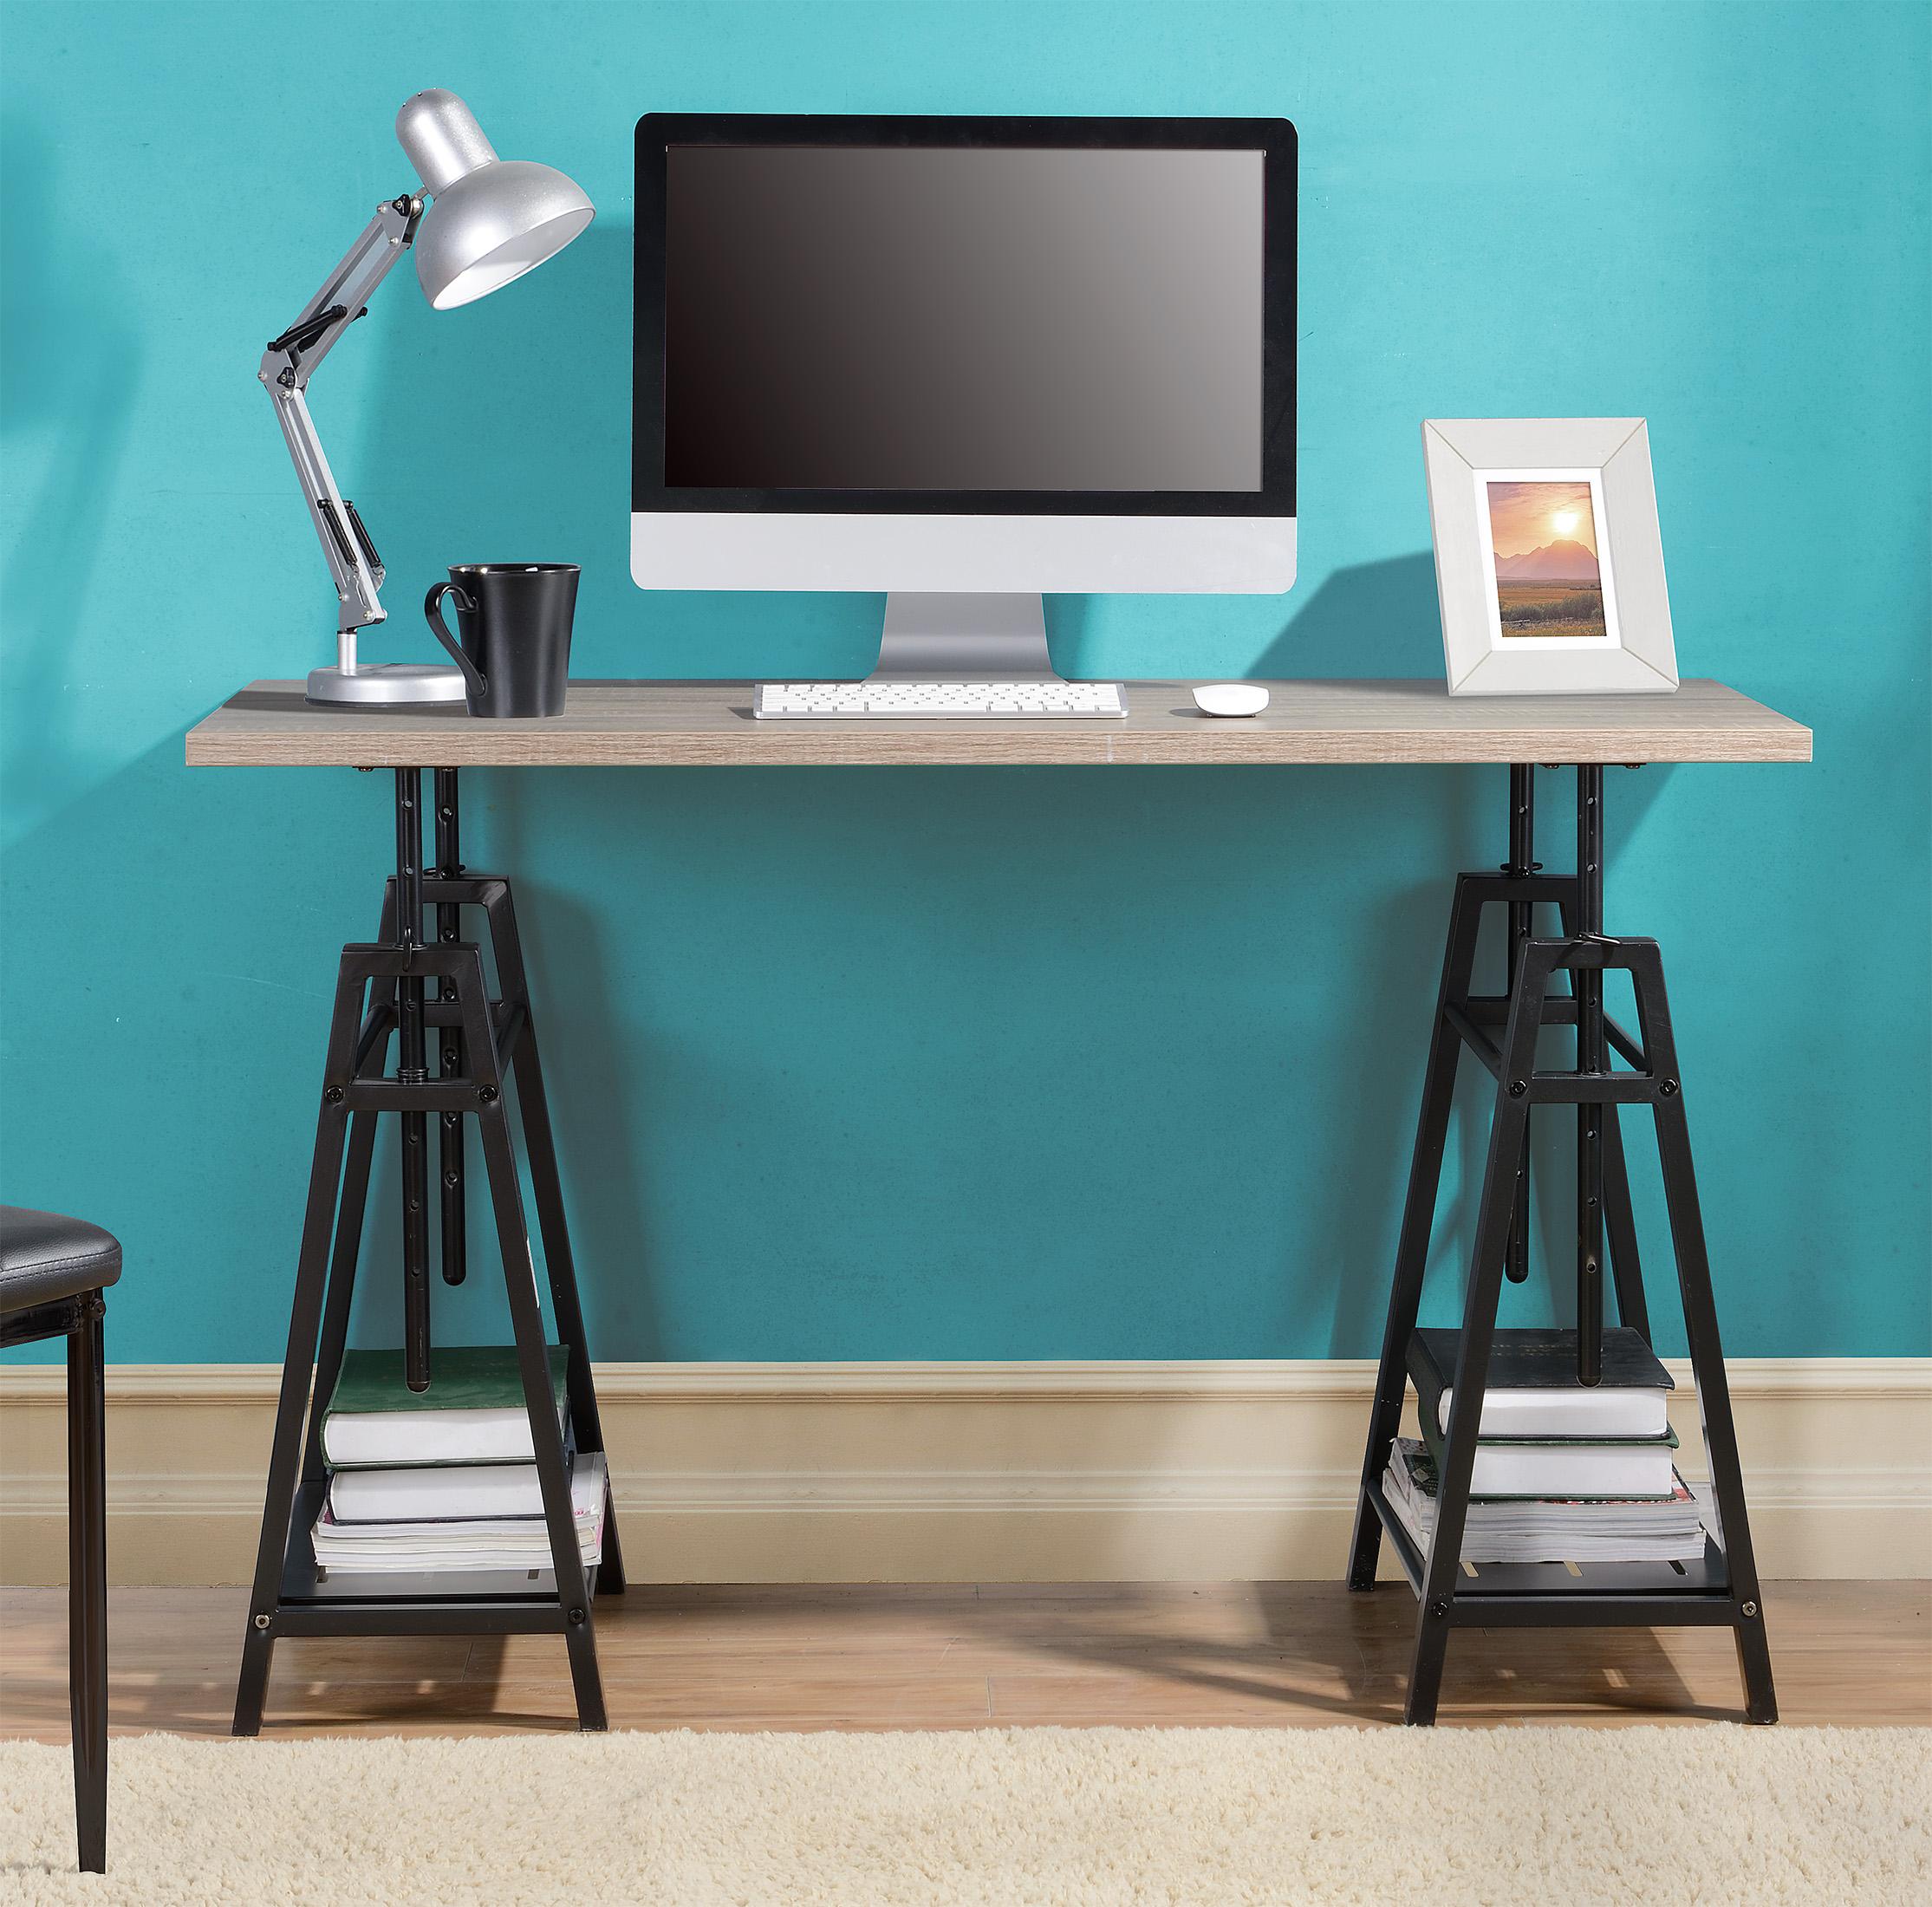 Homestar Height Adjustable Desk in Reclaimed Wood - [Z1430261]